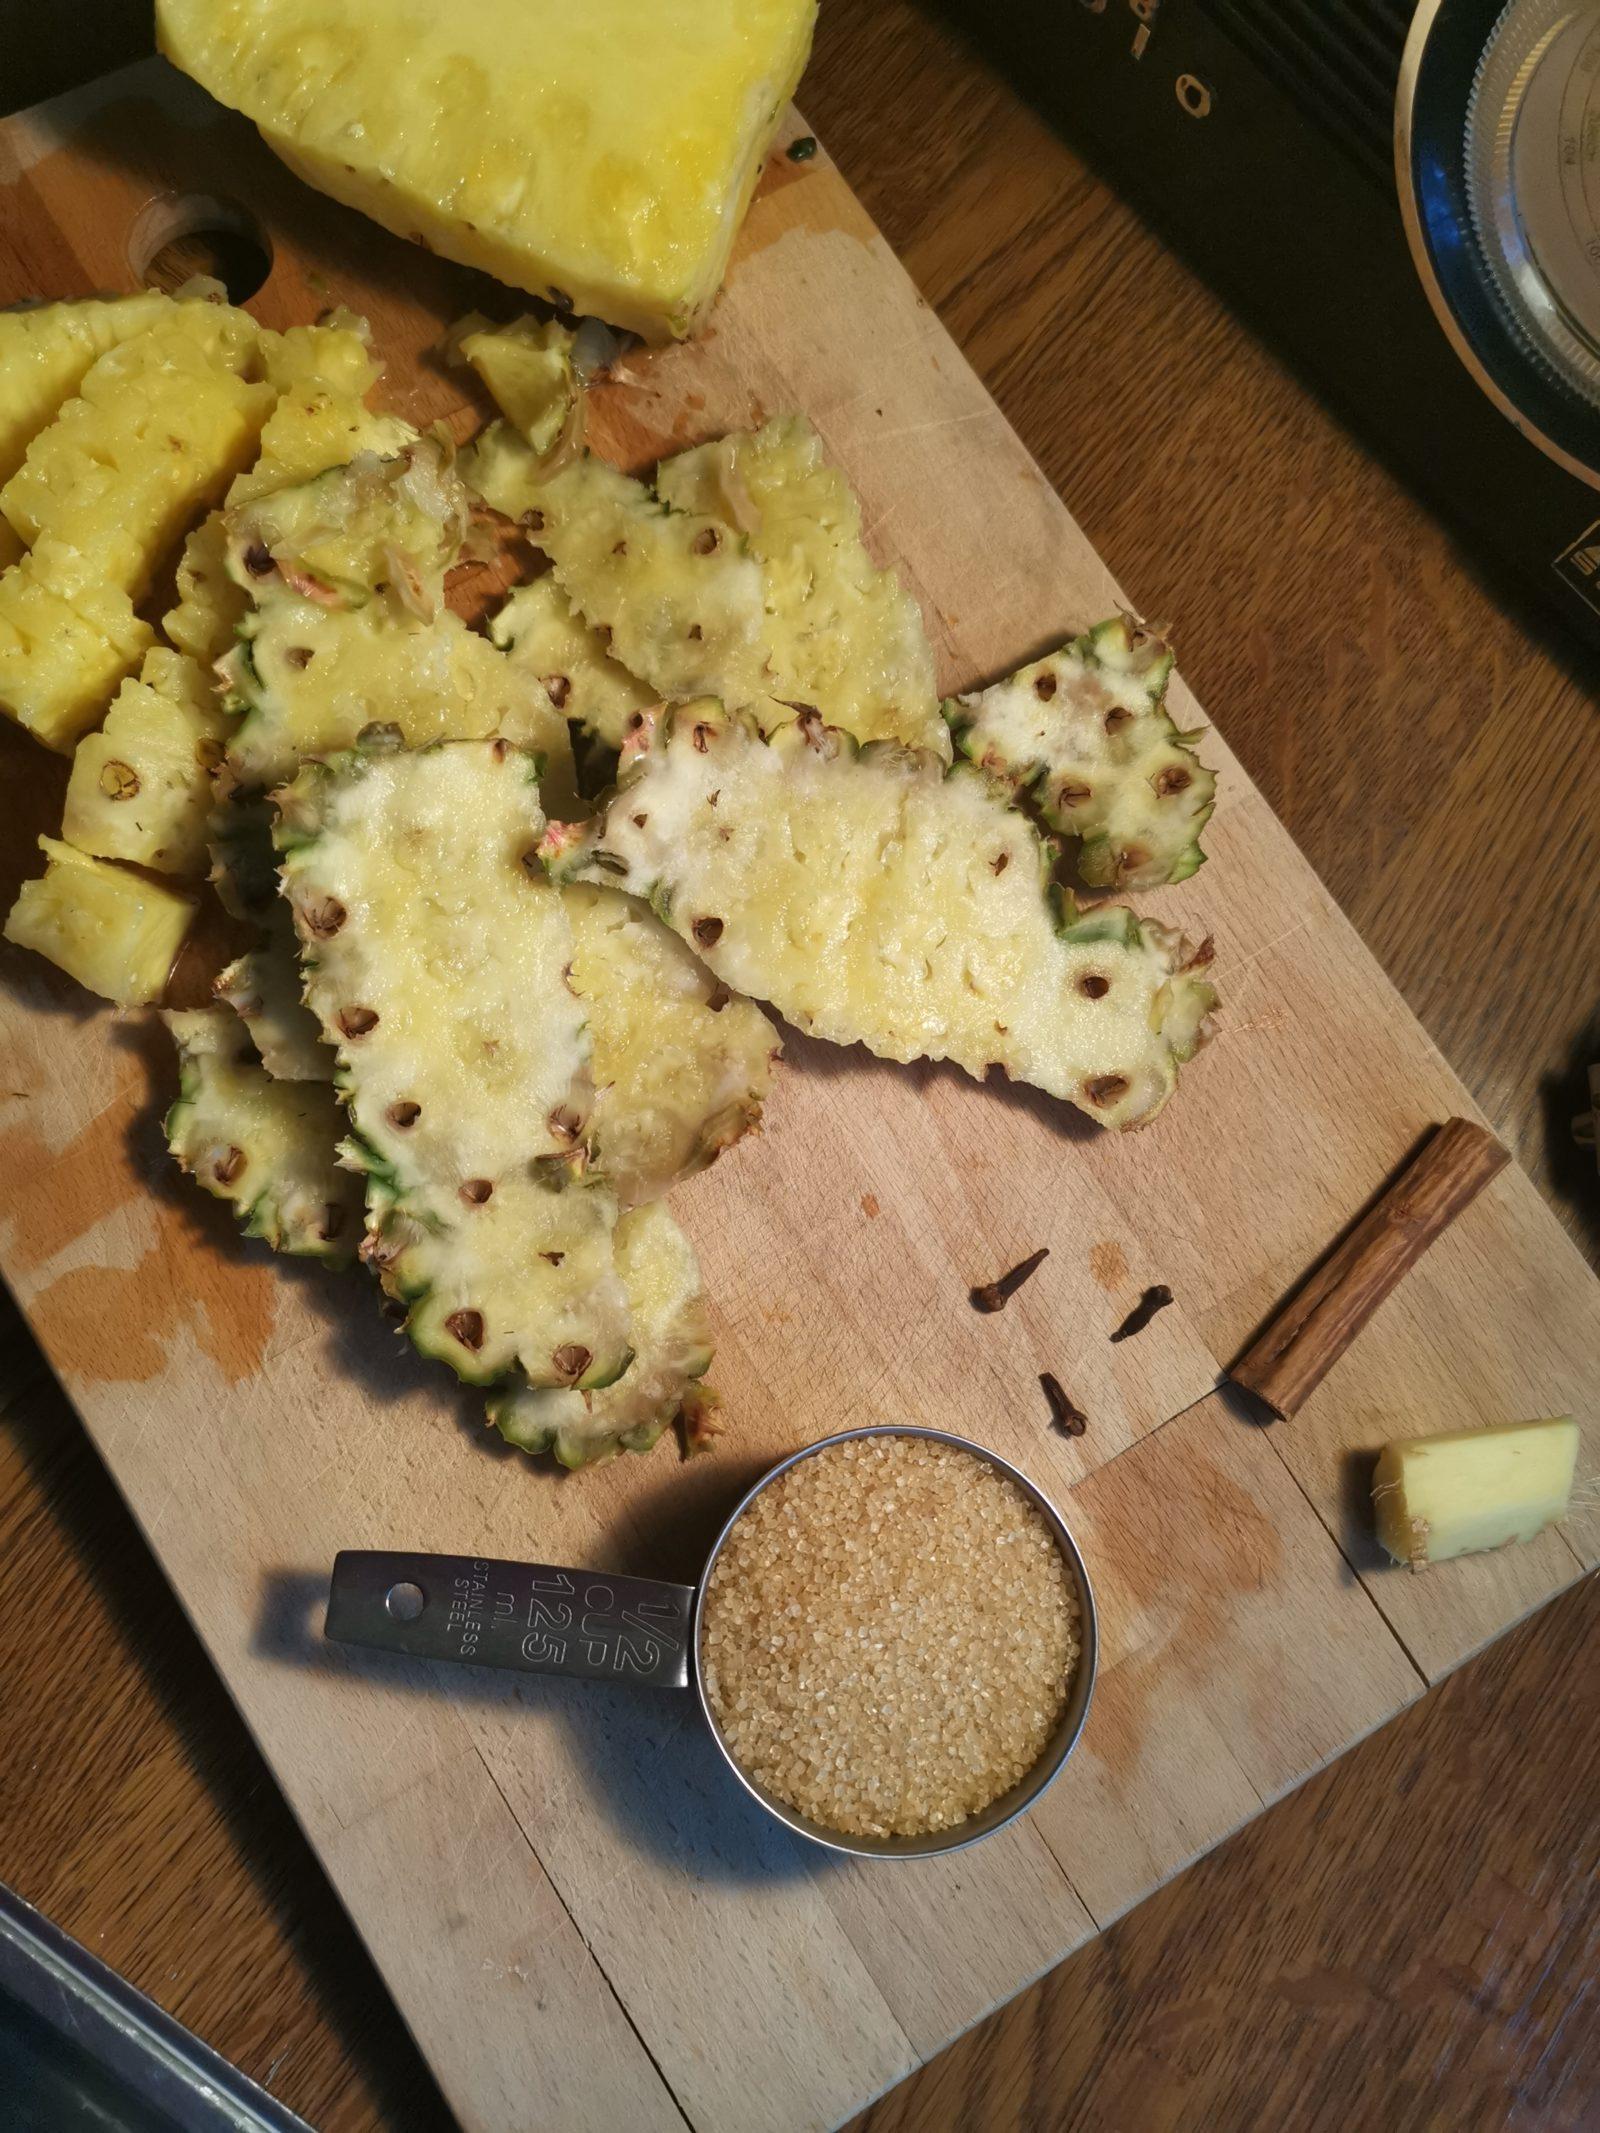 Tepache recipe ingredients